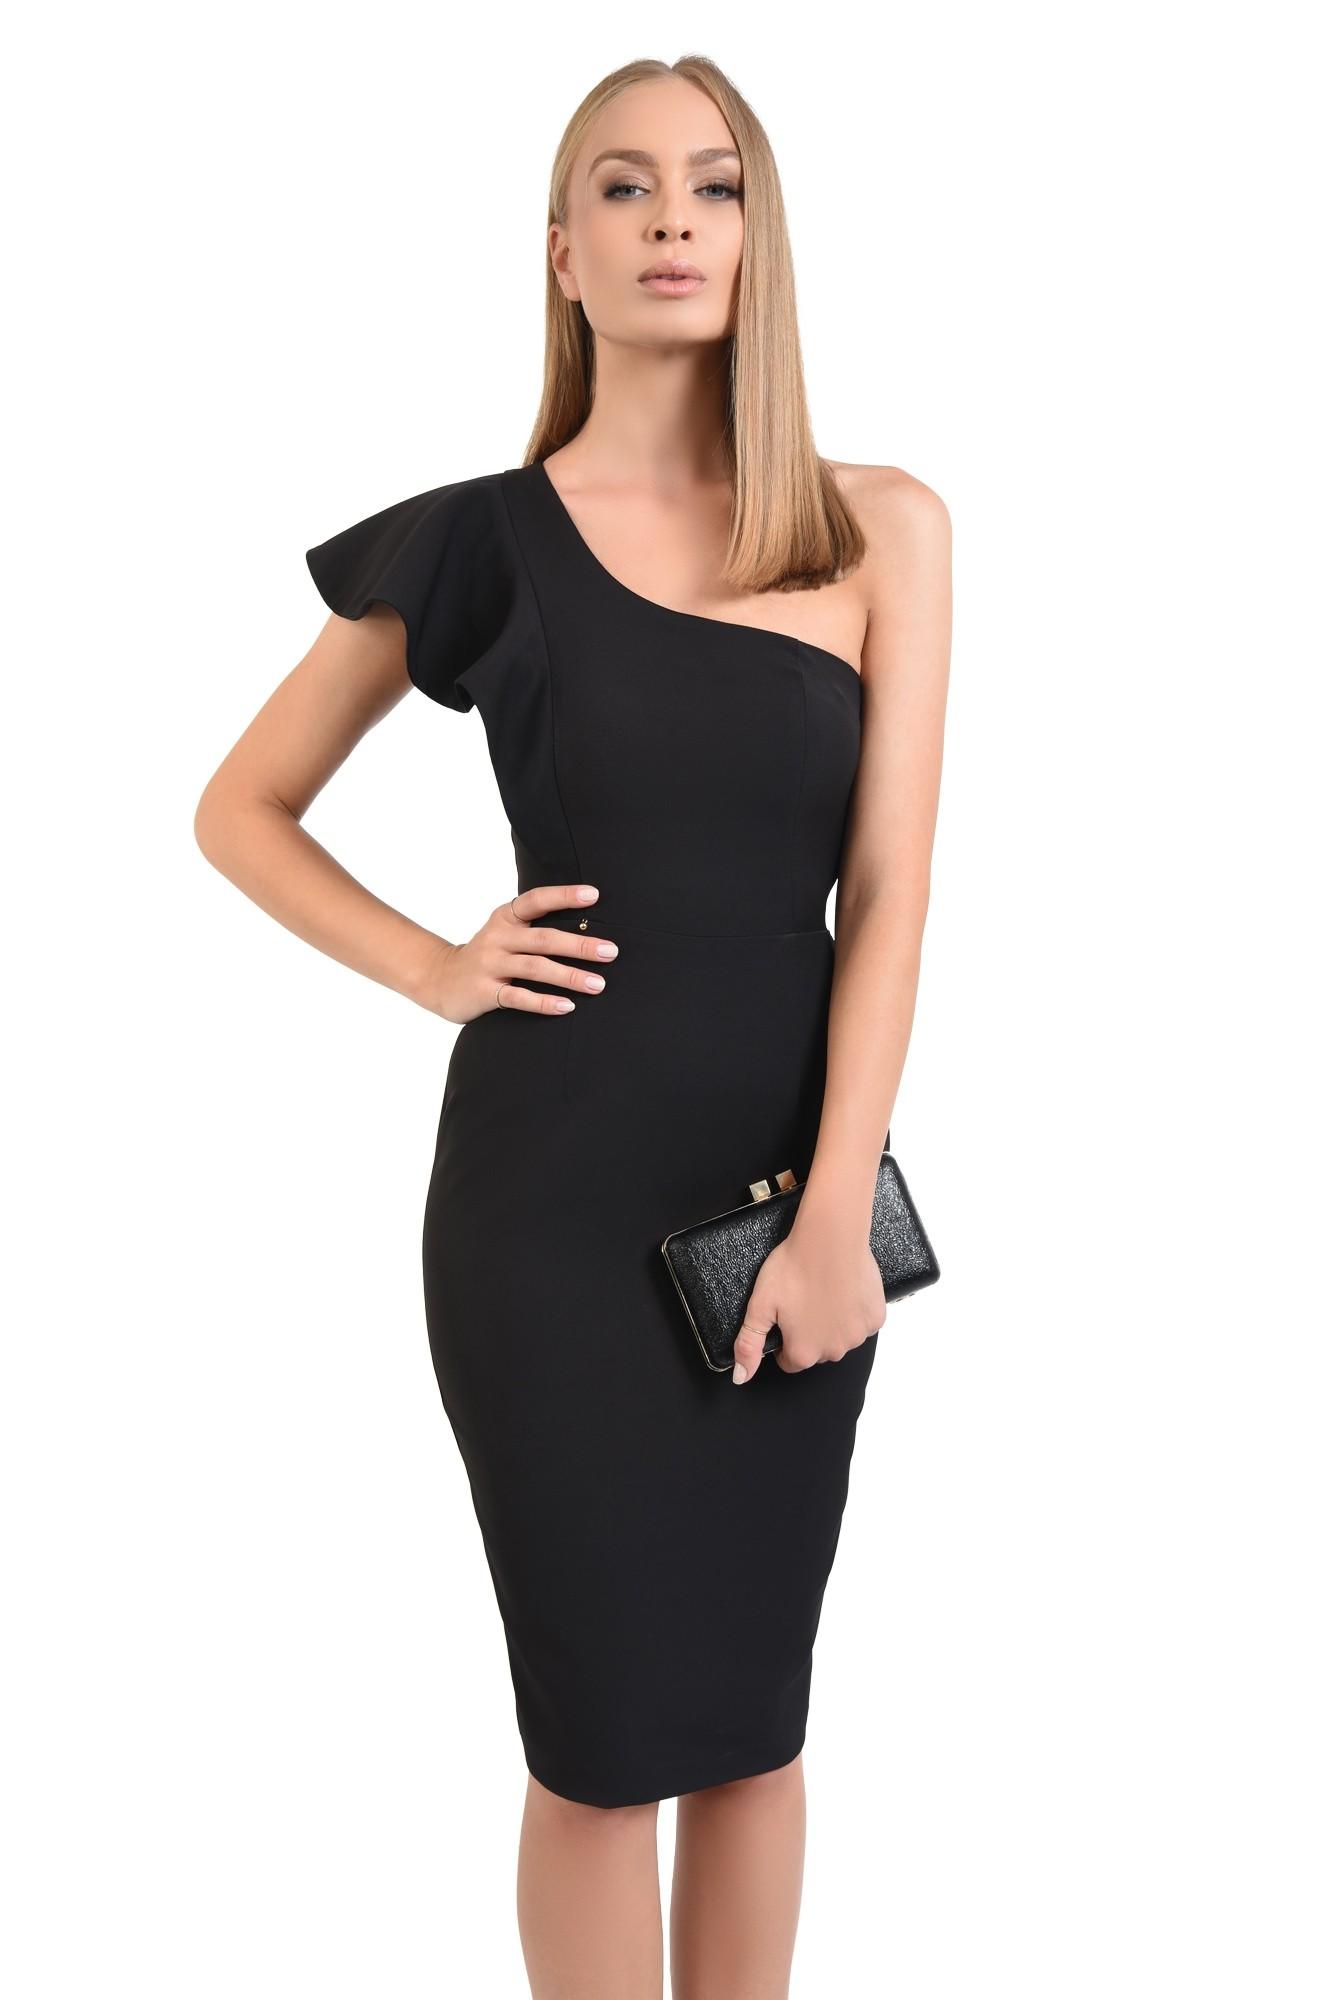 0 - rochie neagra, de seara, volan la umar, rochii online